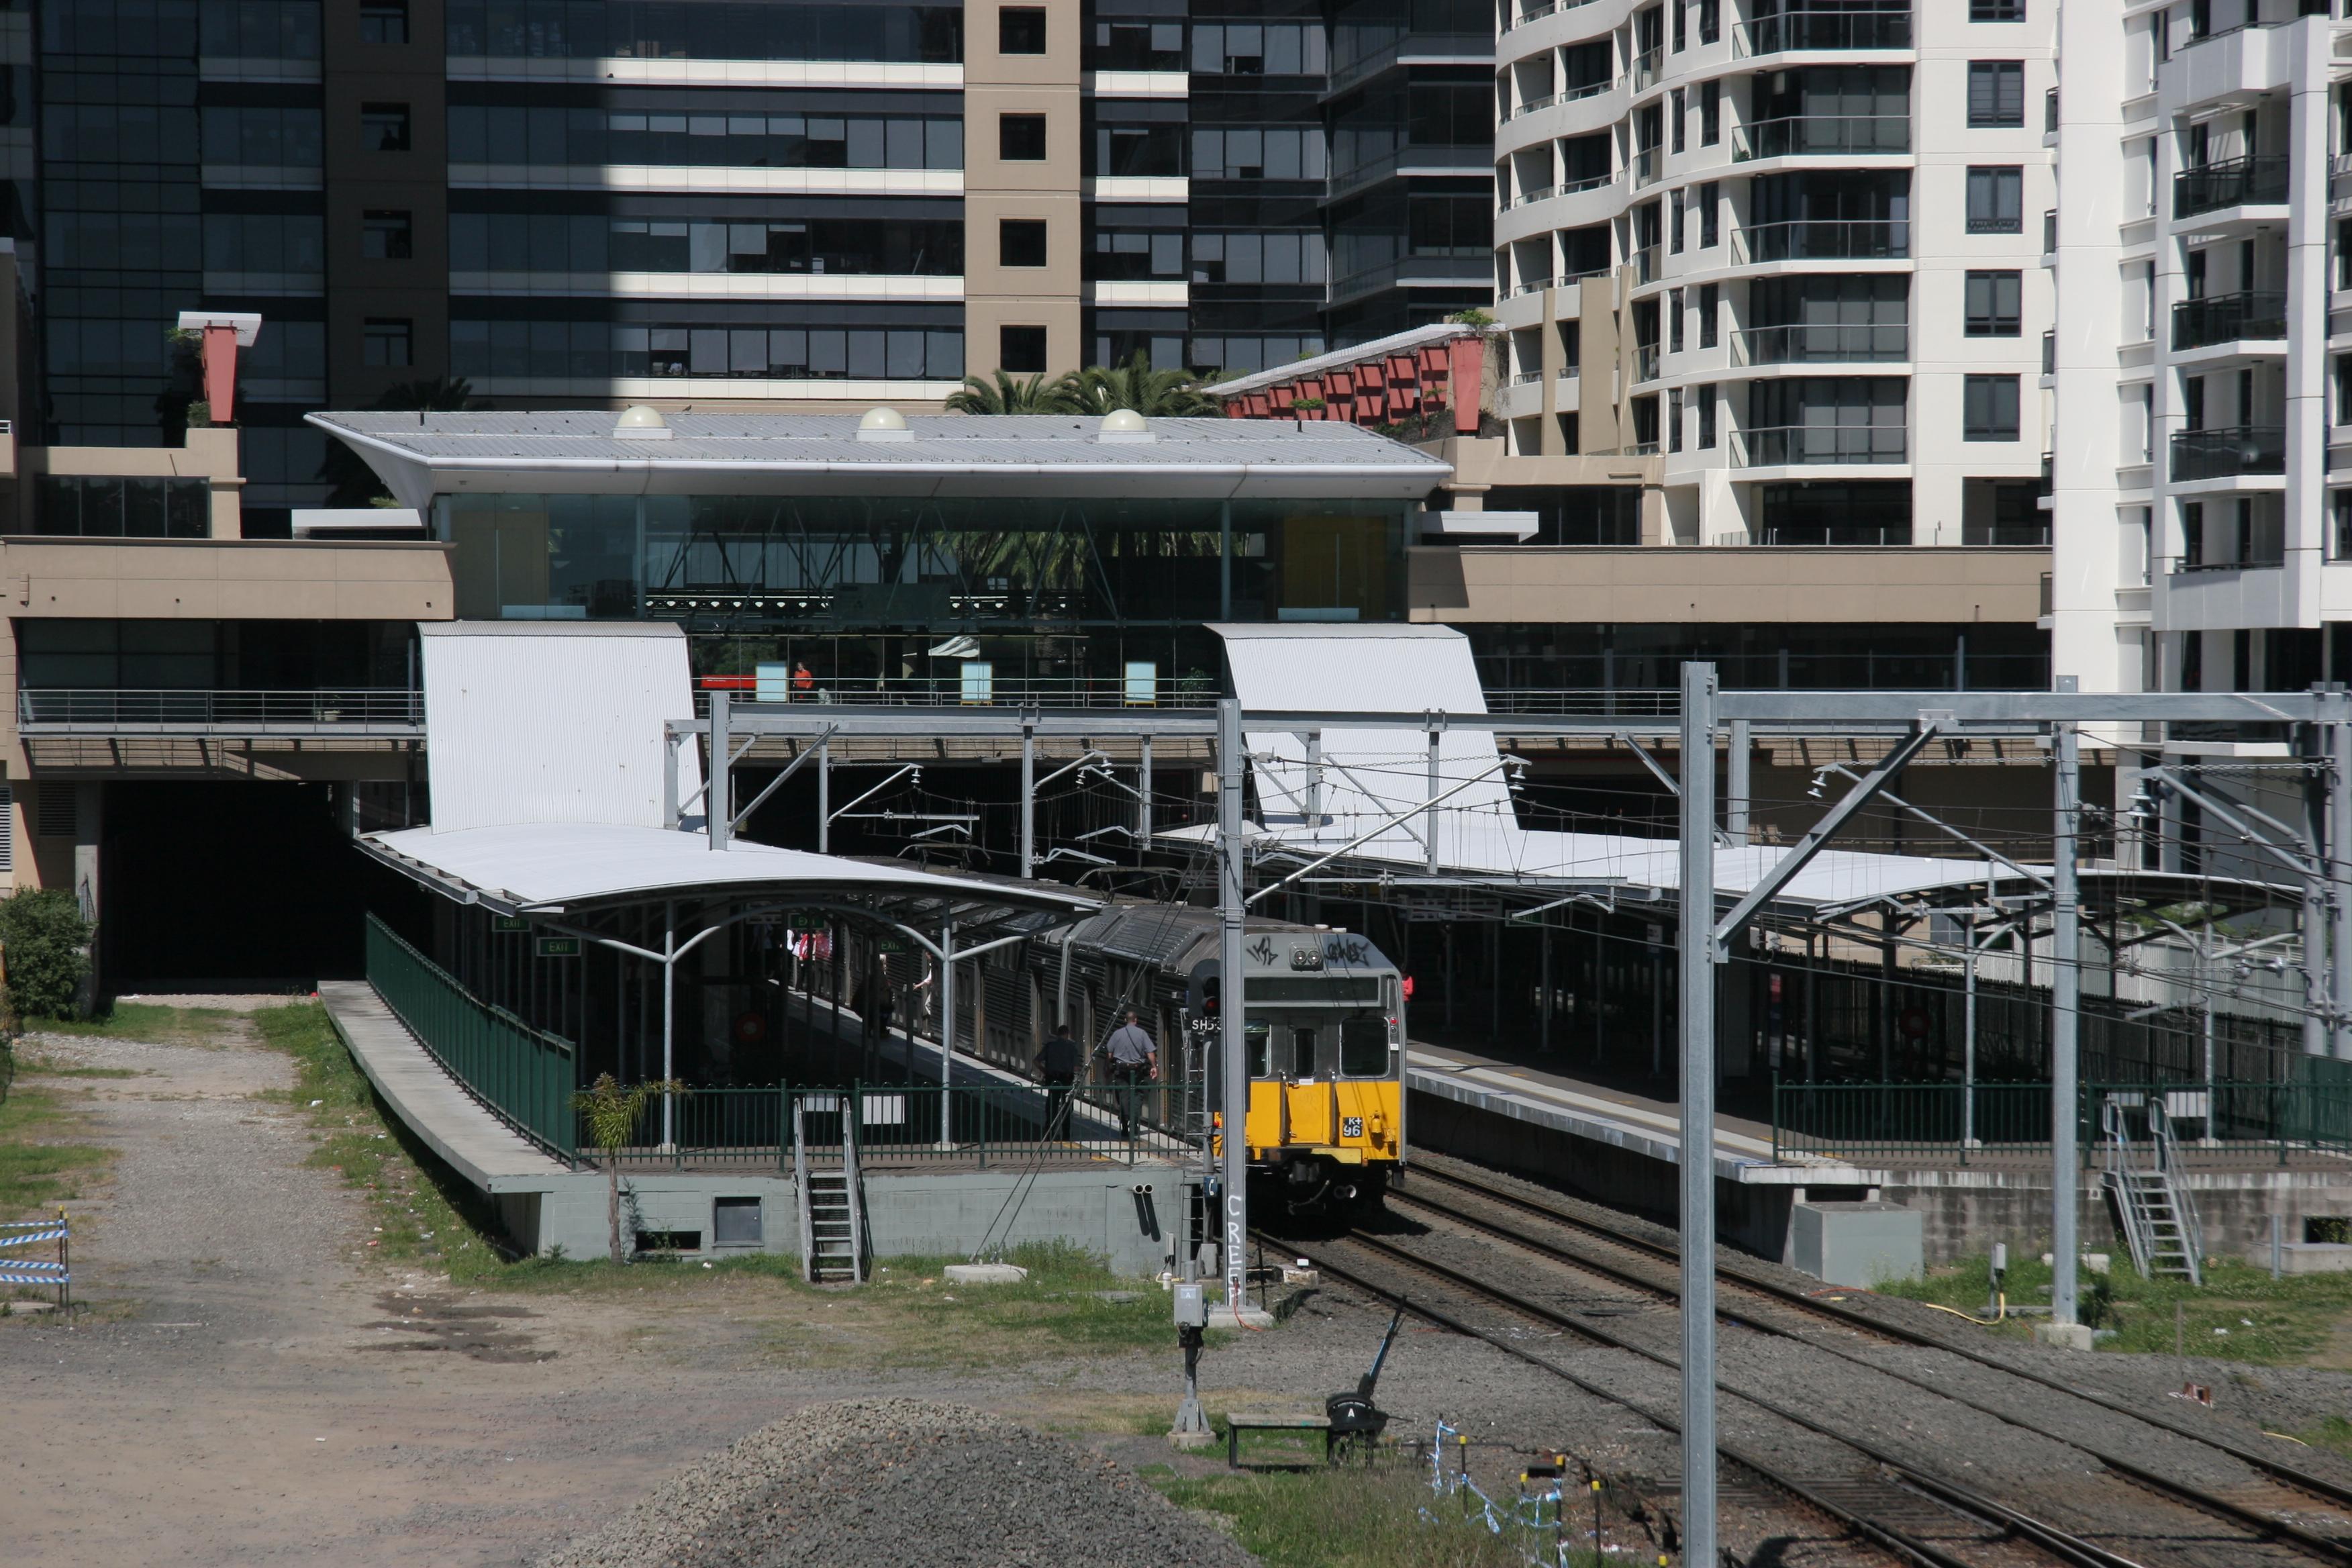 St Leonards Station